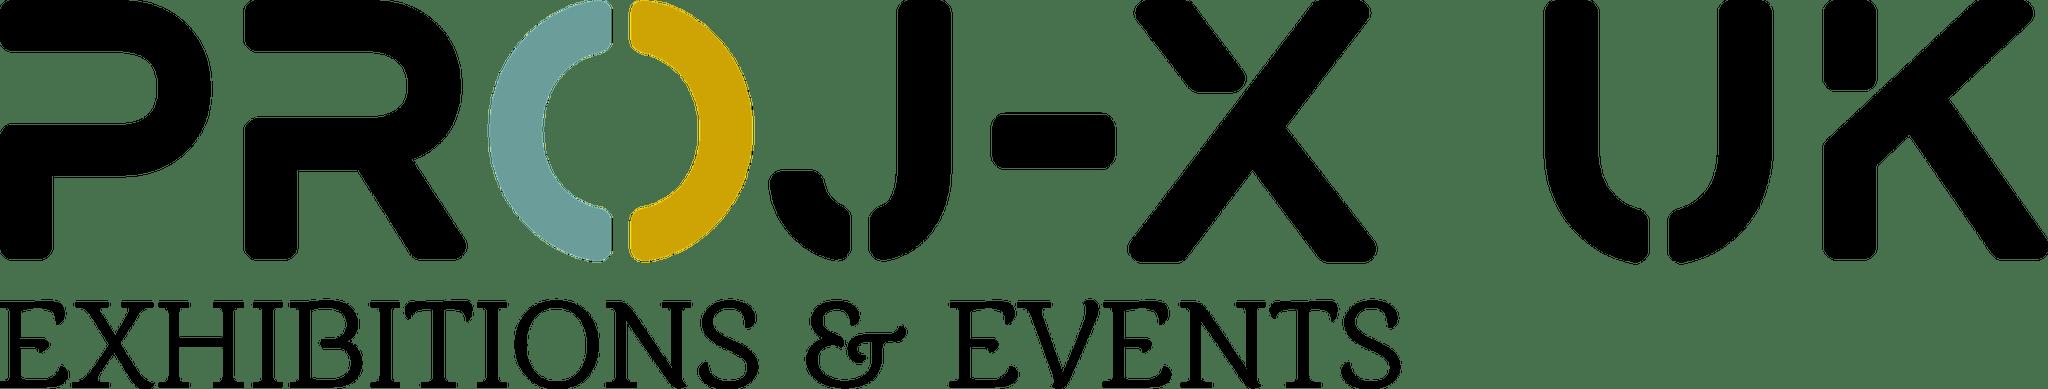 PROJ-X